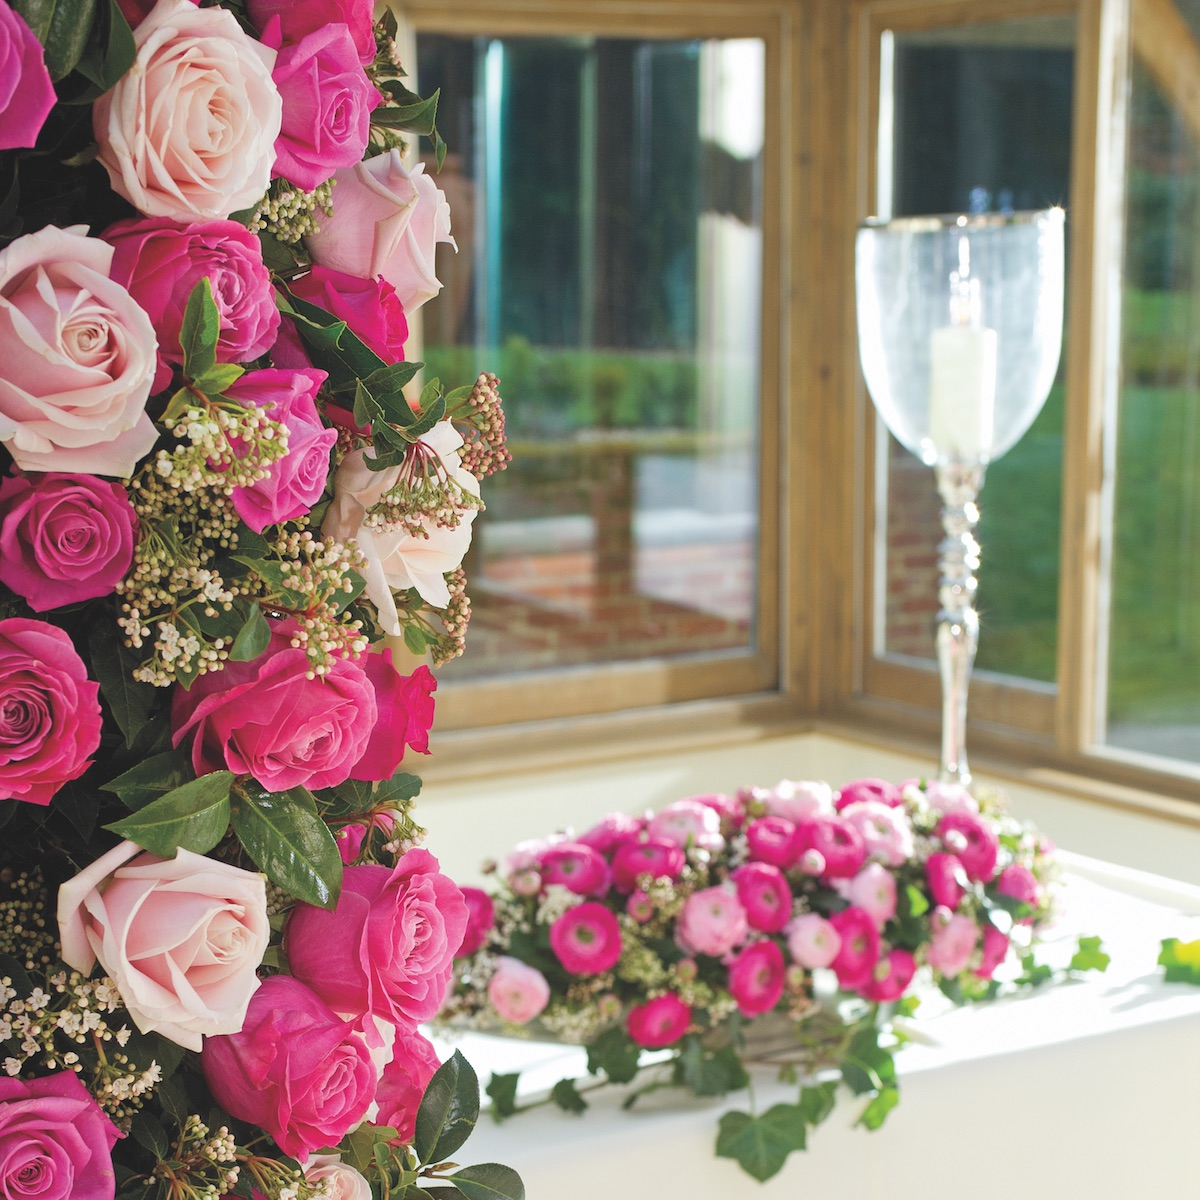 Why brides choose roses for weddings flower magazine roses for weddings izmirmasajfo